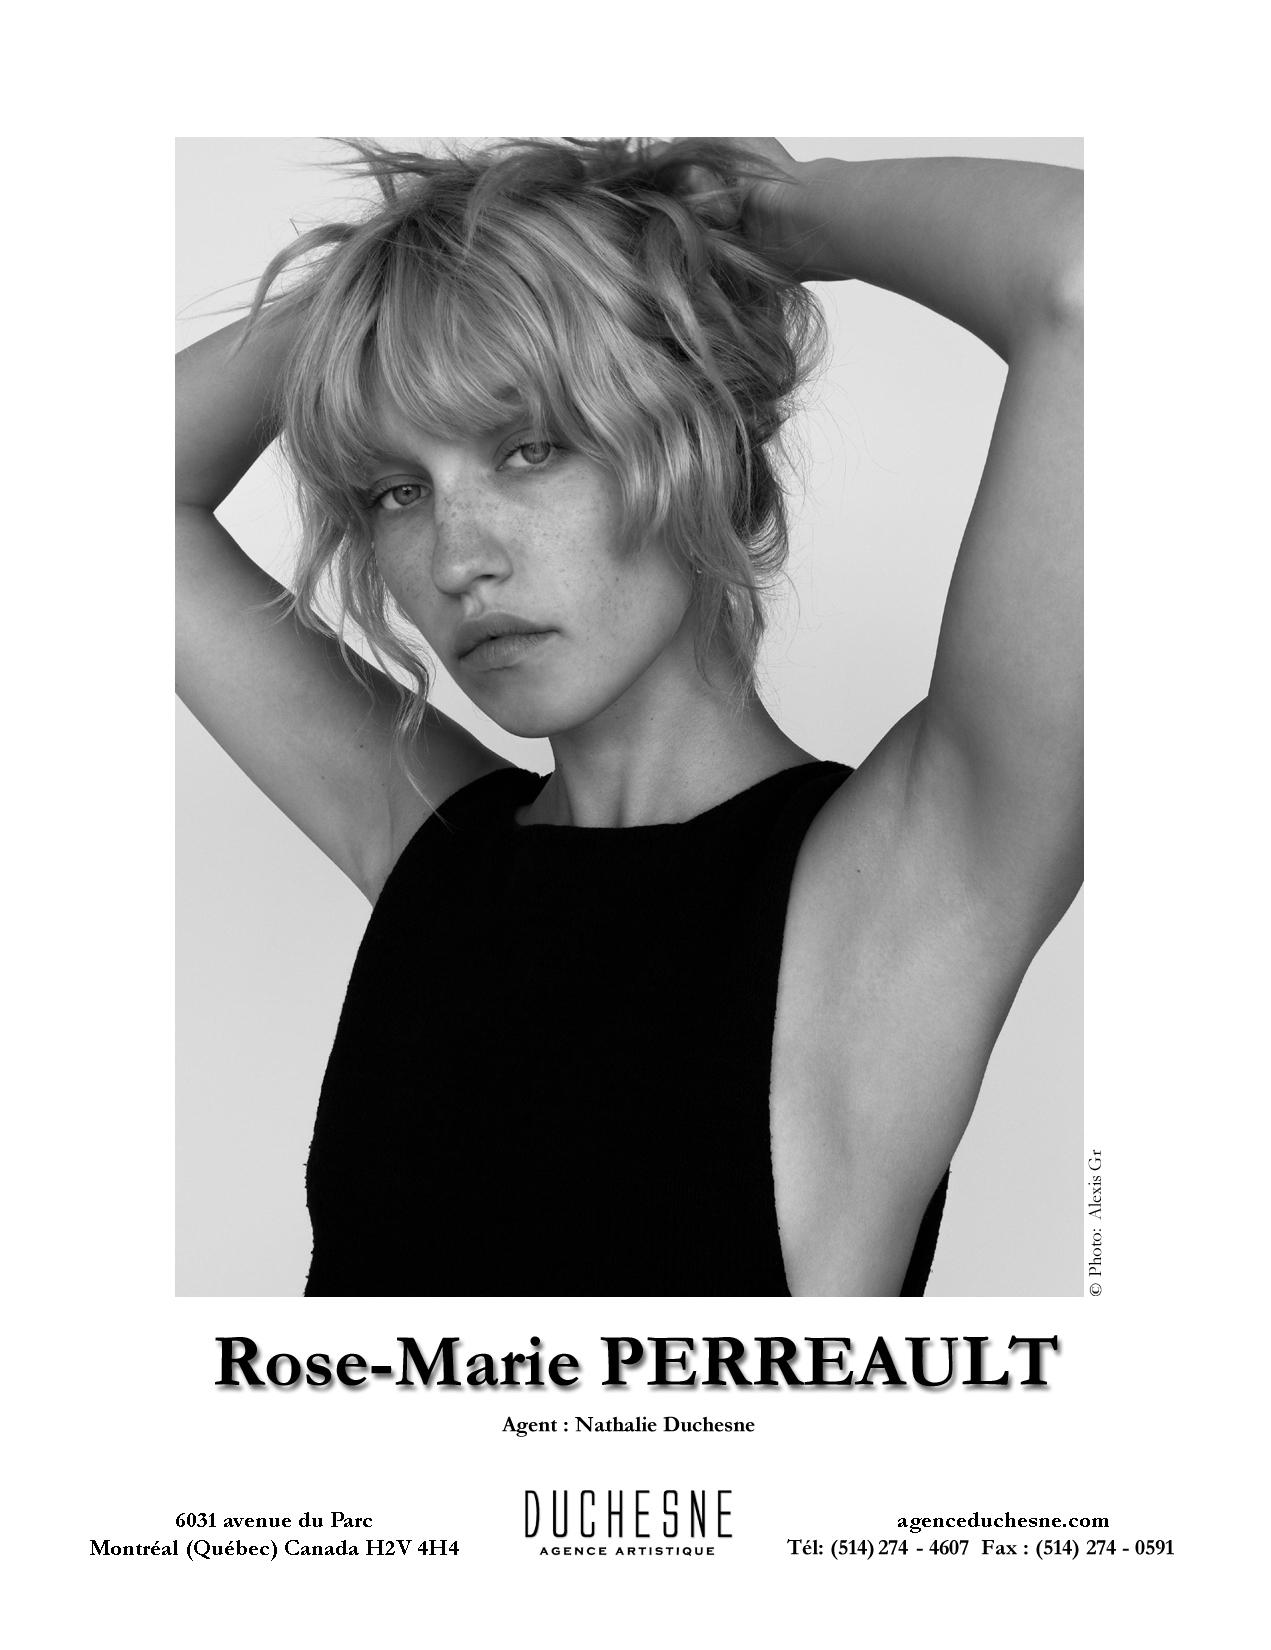 Rose Marie Perreault Cv Agence Artistique Duchesne